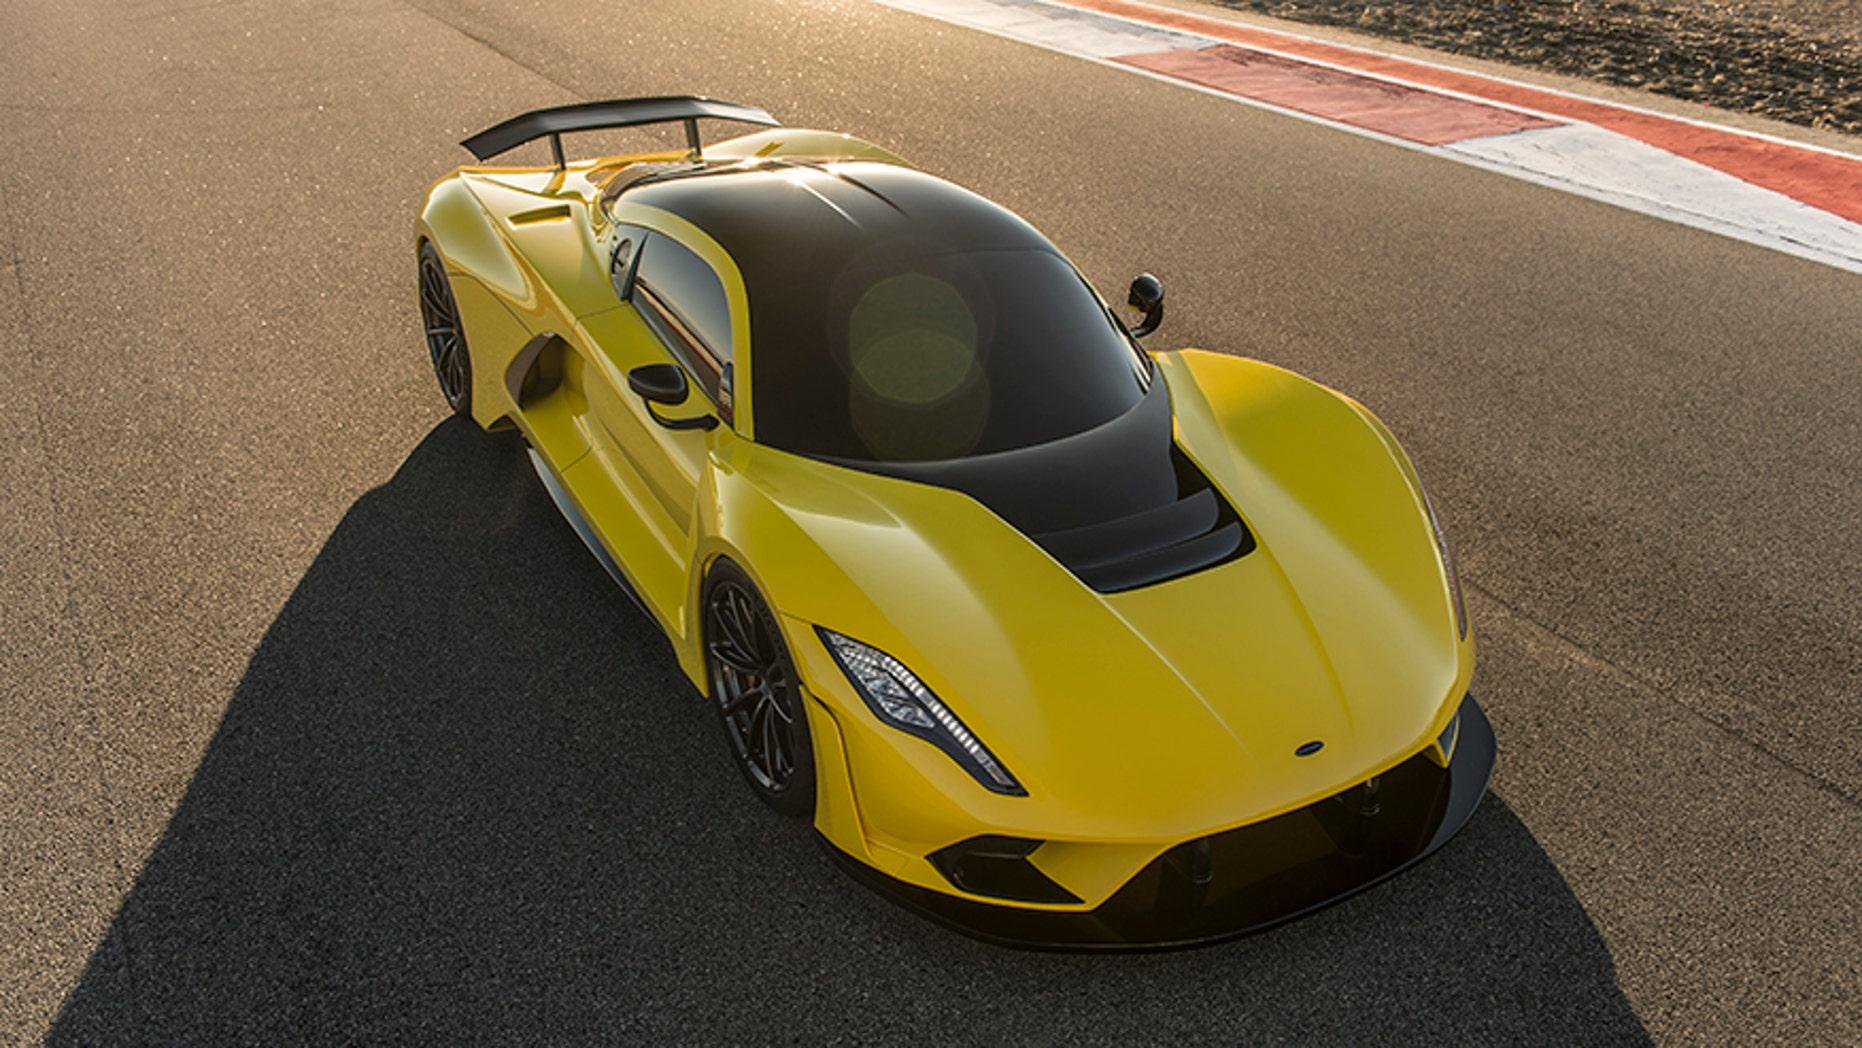 $1.6 million Hennessey Venom F5 designed to go 300 mph | Fox News